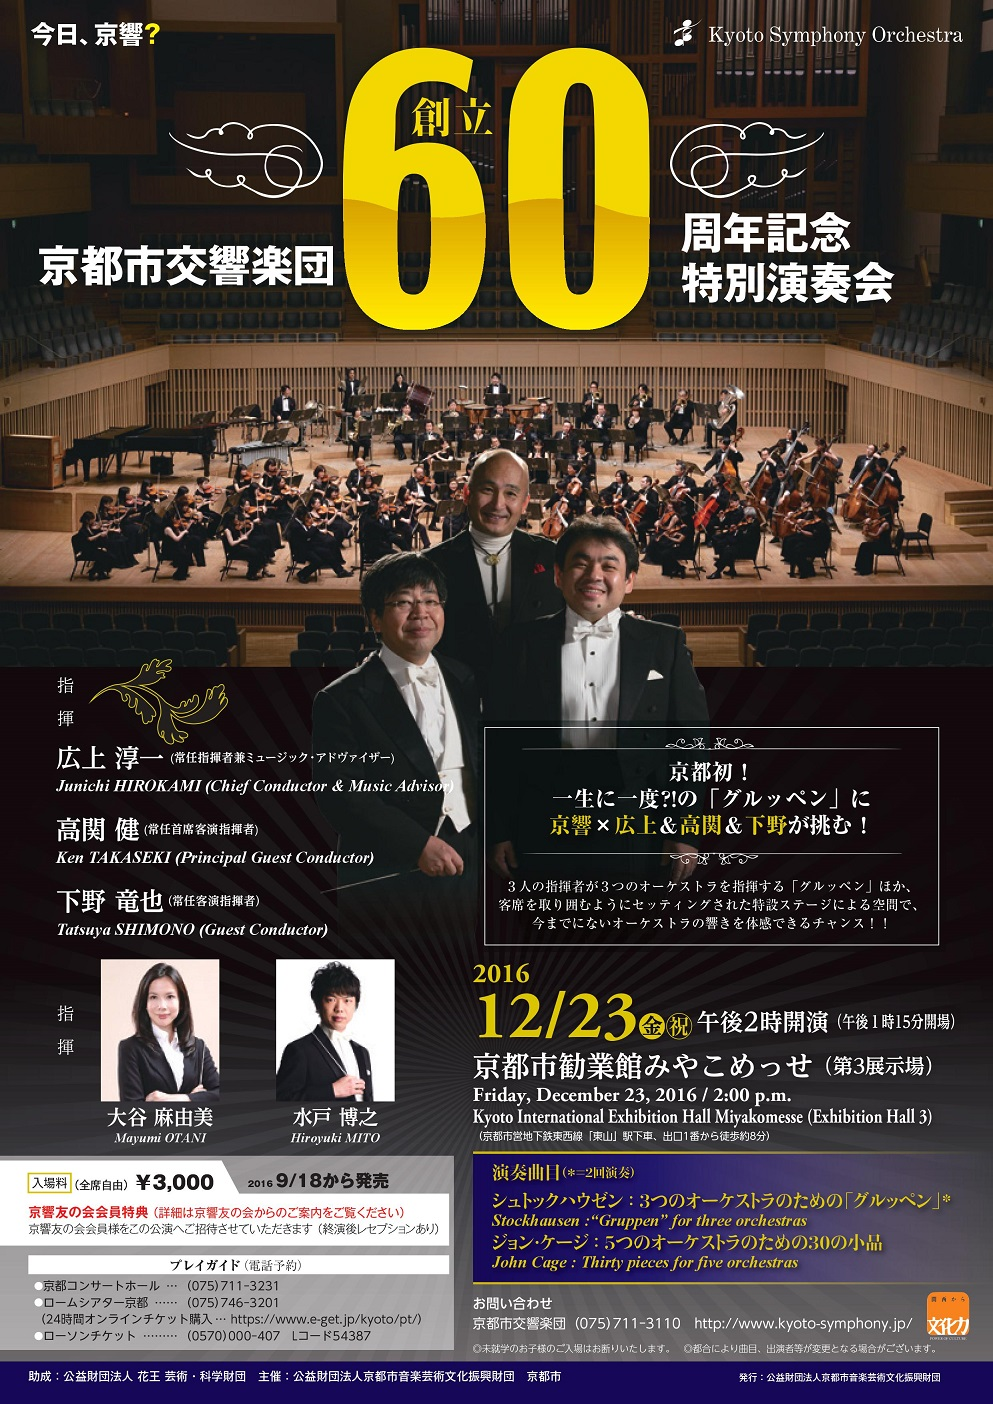 This week's concert (19 December – 25 December, 2016)